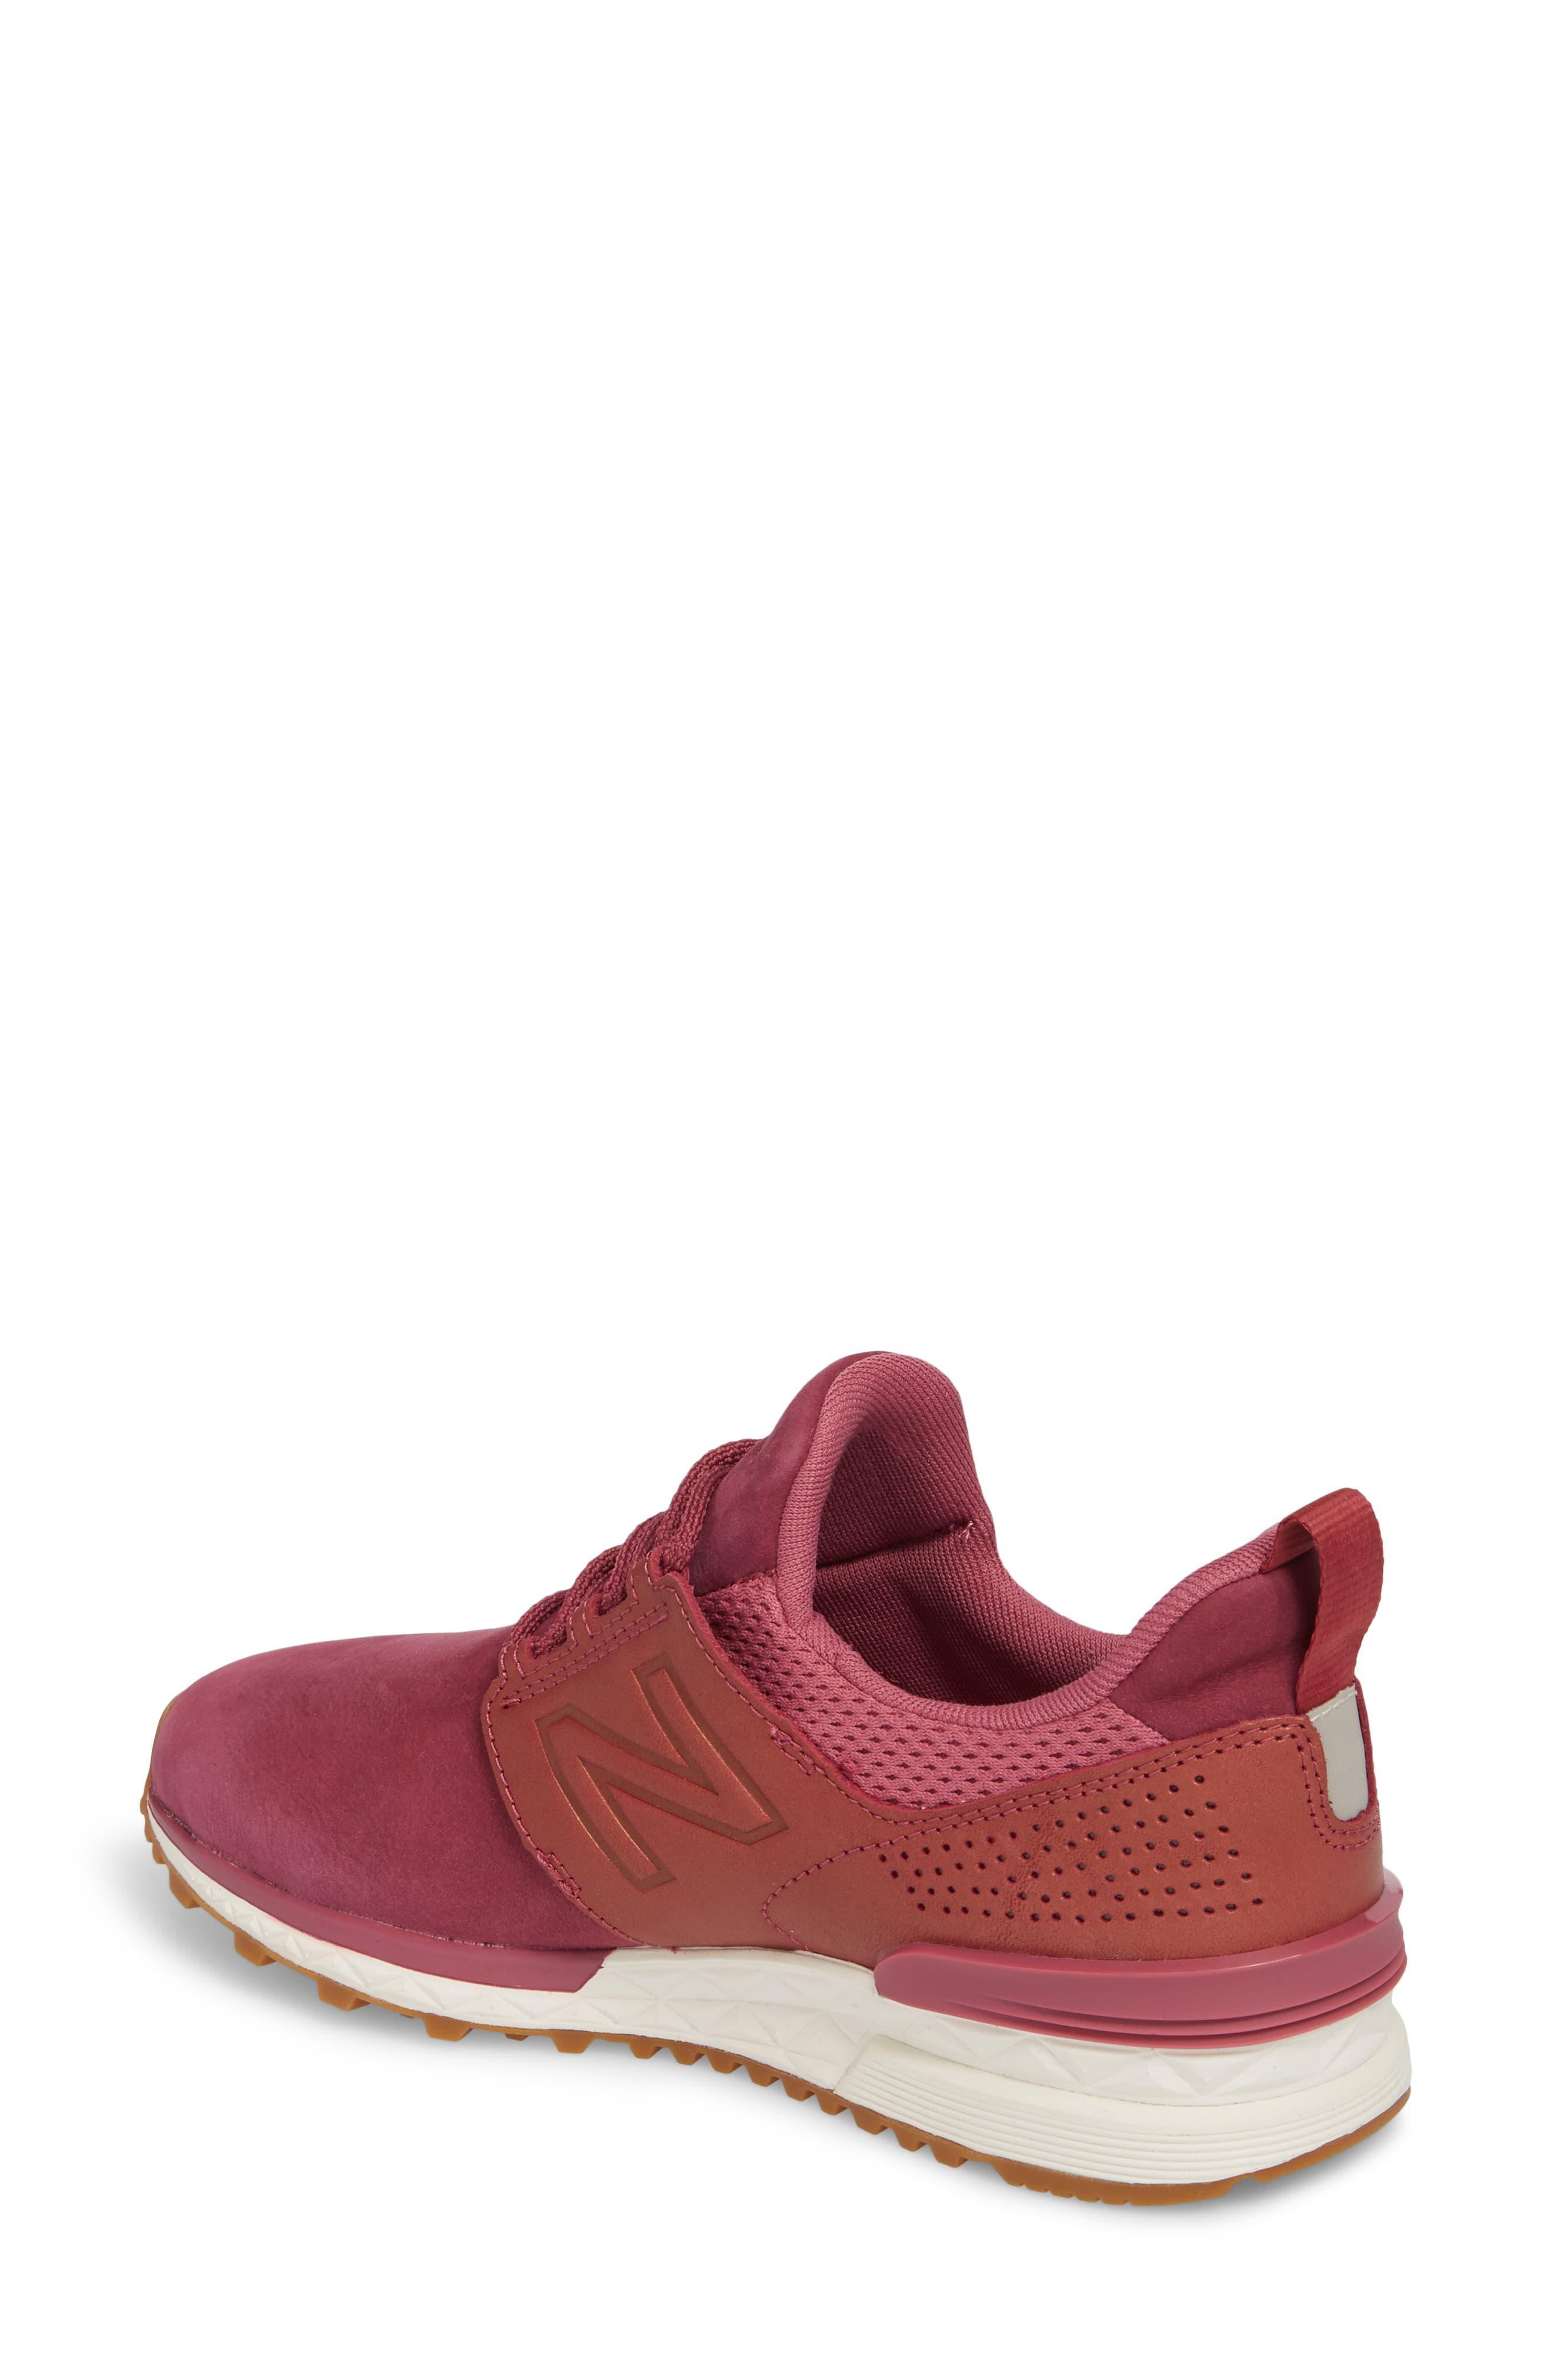 Nubuck 574 Sport Sneaker,                             Alternate thumbnail 2, color,                             Dragon Fruit